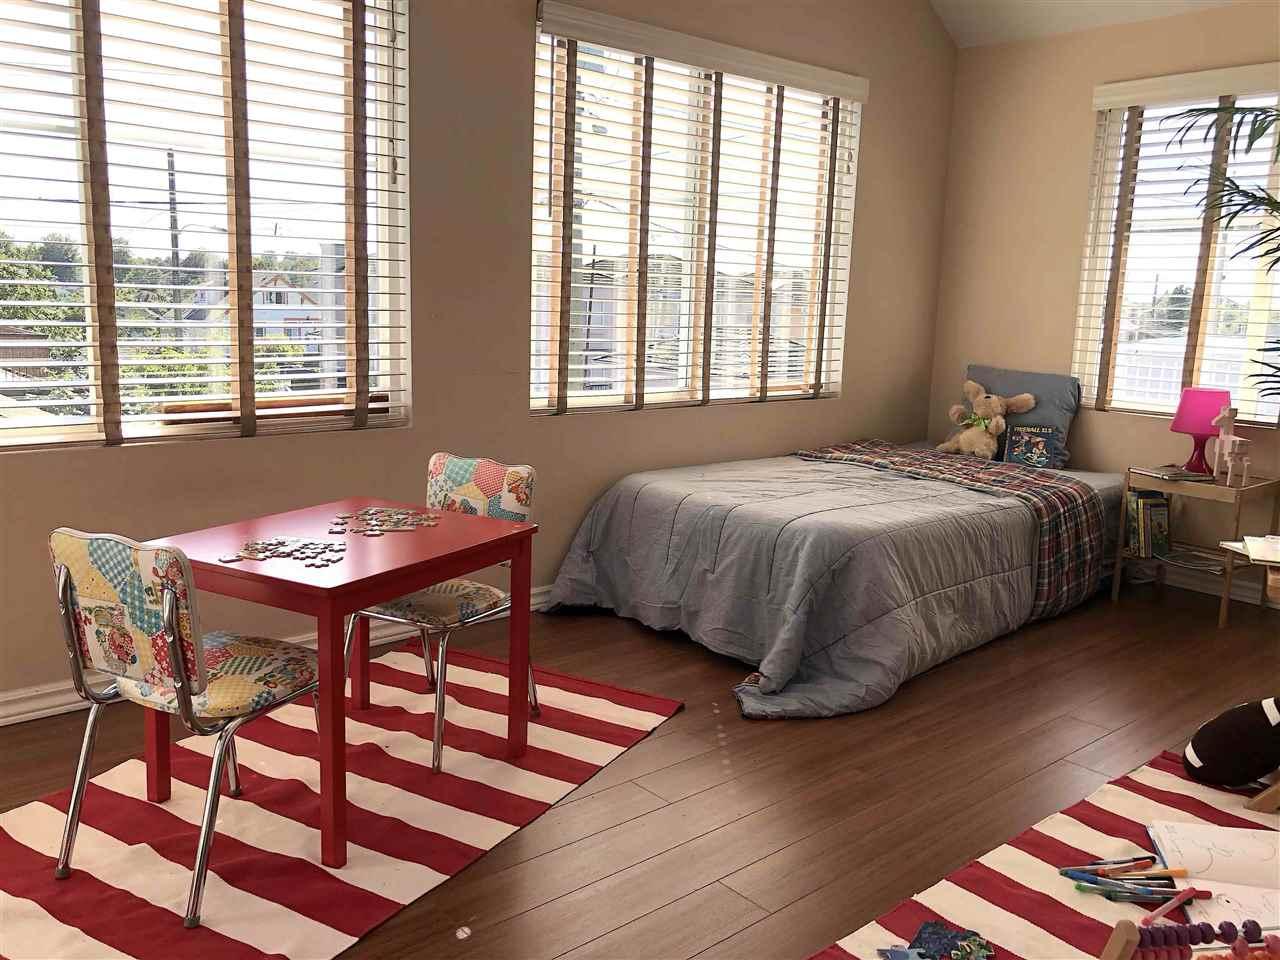 2684 TURNER STREET - Hastings Sunrise House/Single Family for sale, 5 Bedrooms (R2497817) - #15